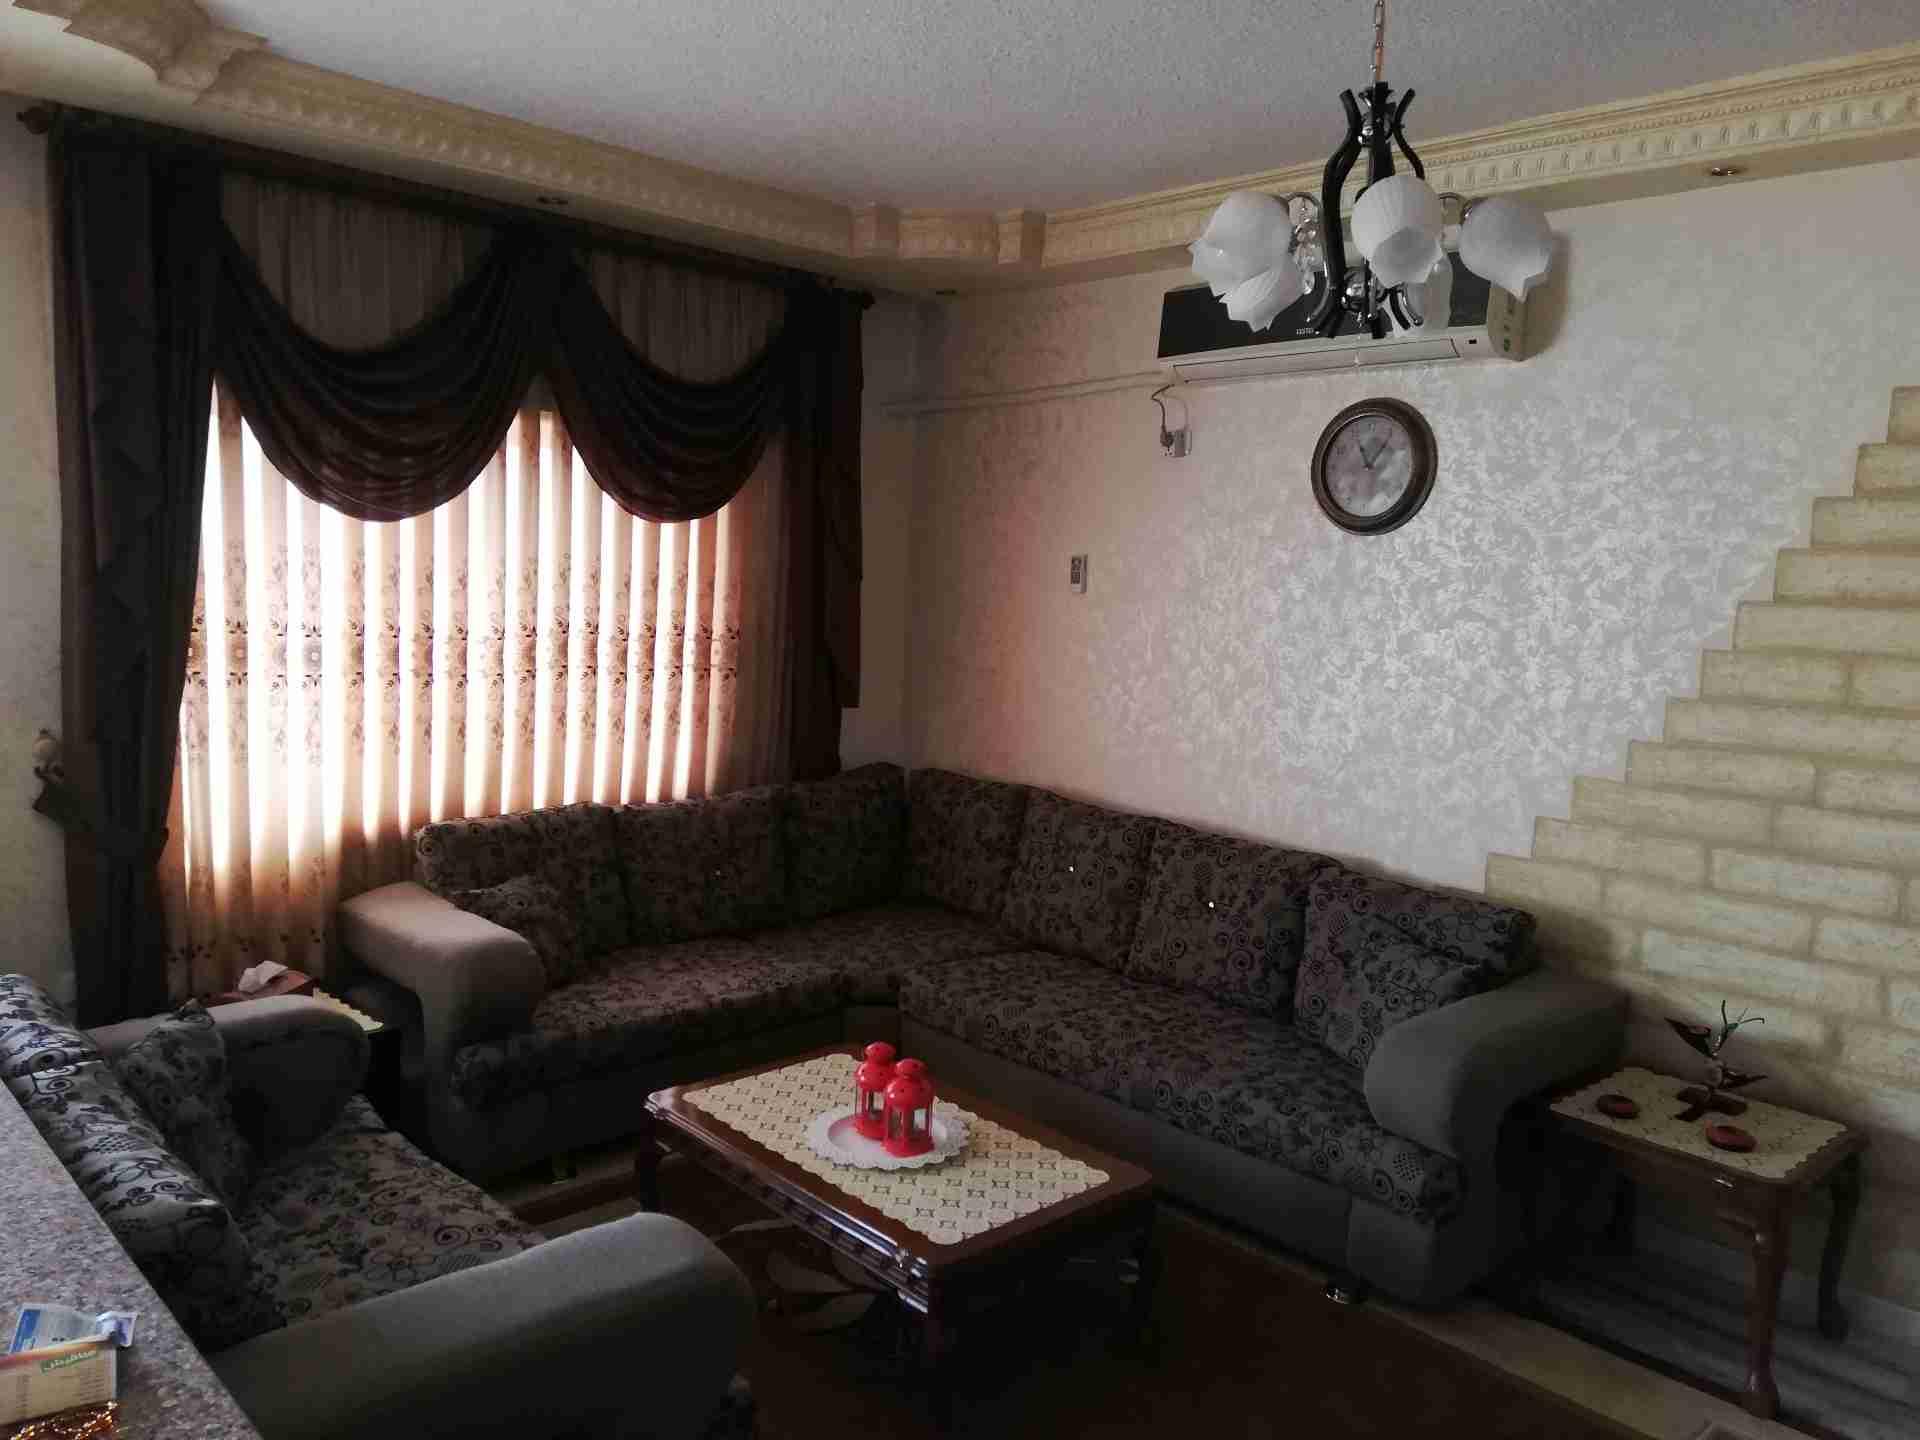 Stunning One Bedroom Apartment With Exceptionally Large Terrace-  شقة للإيجار في الجبيهة...